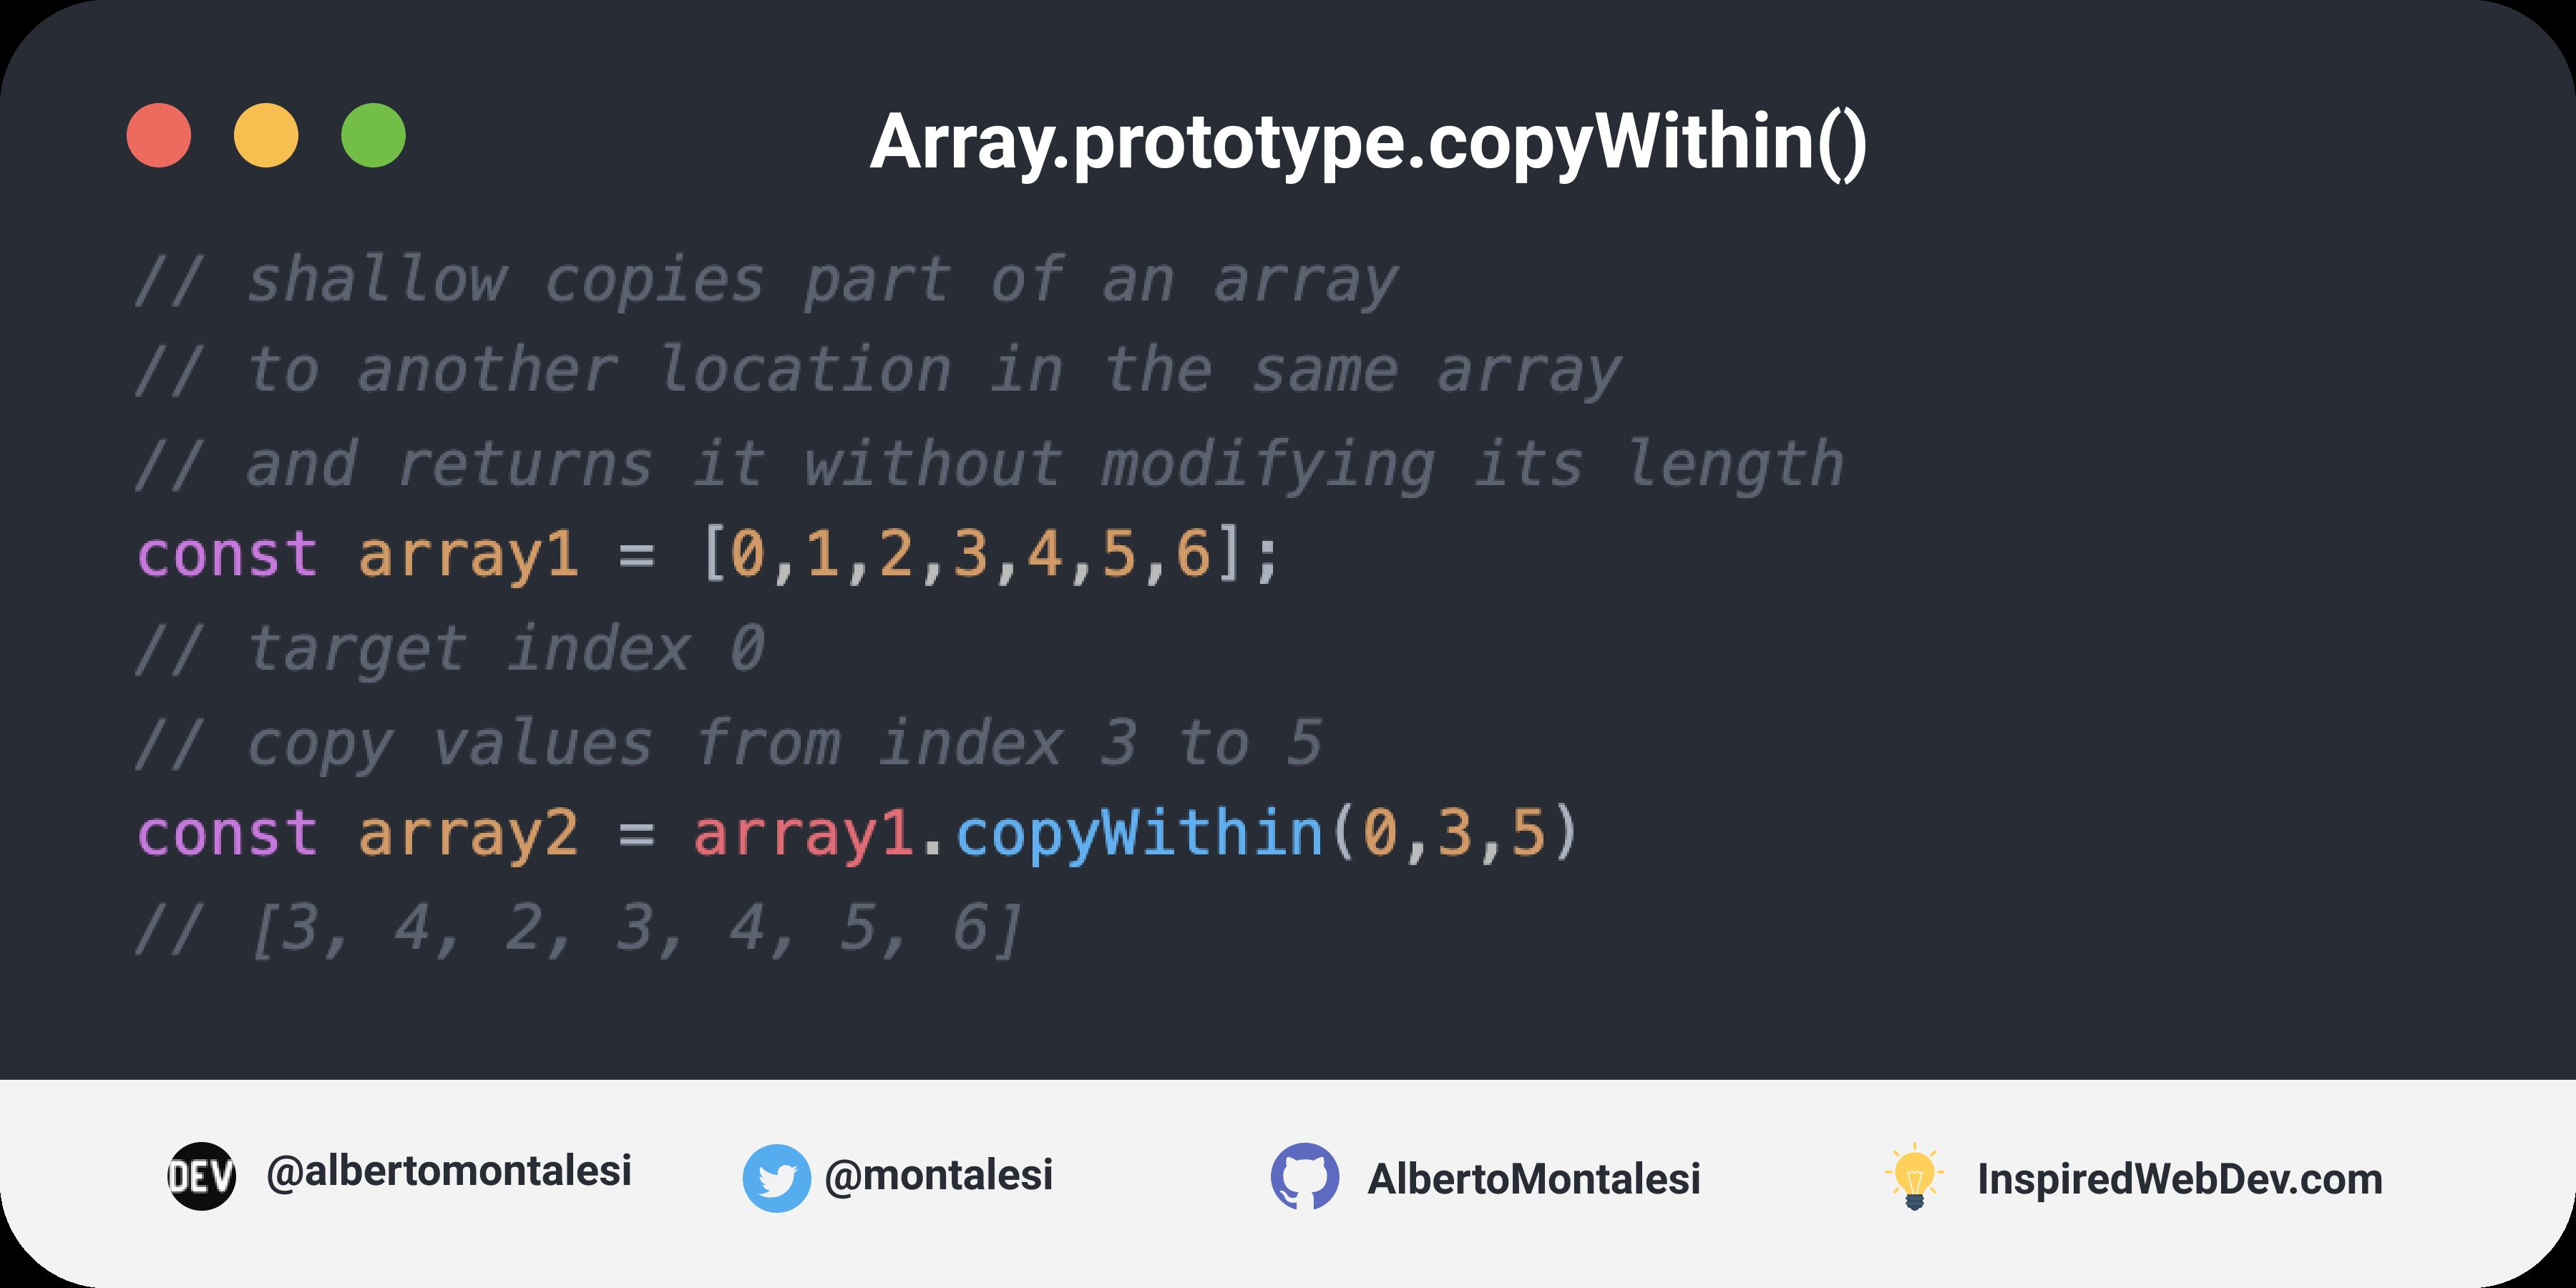 Array.prototype.copyWithin()